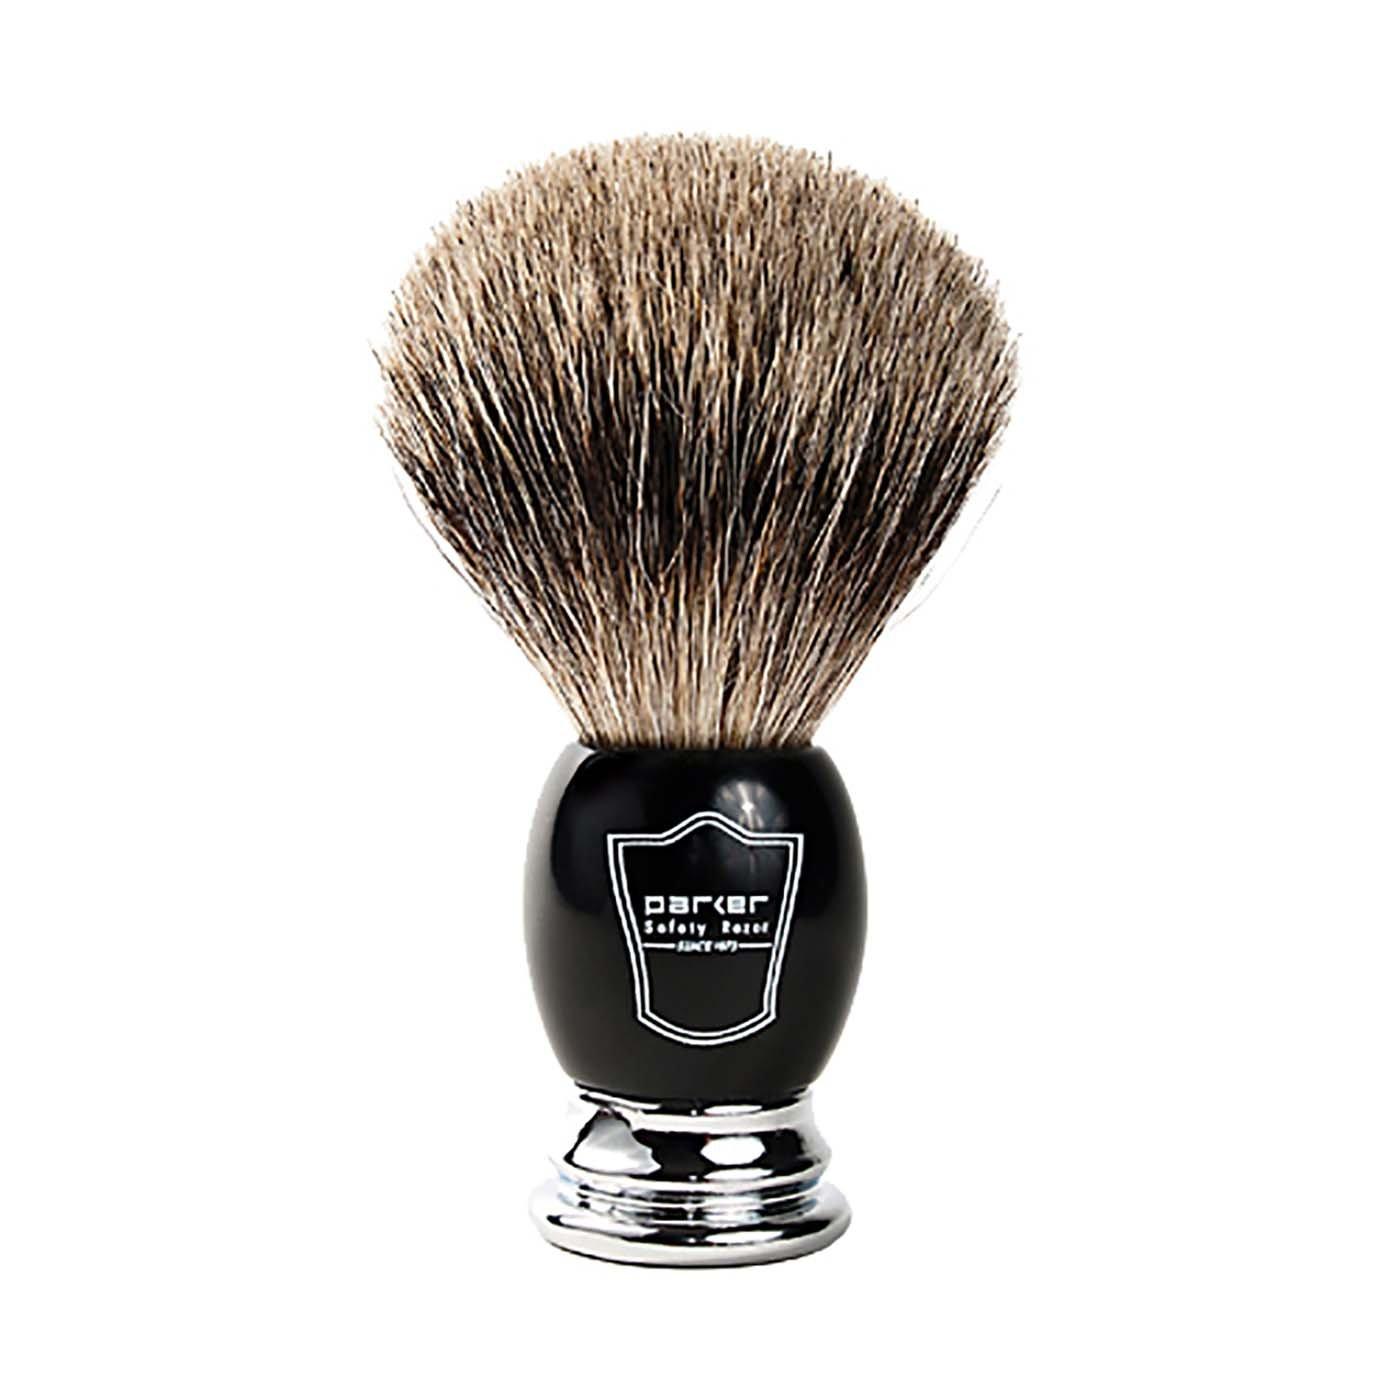 Parker Safety Razor Handmade Deluxe ''Long Loft'' 100% Pure Badger Shaving Brush with Black & Chrome Handle - Brush Stand Included